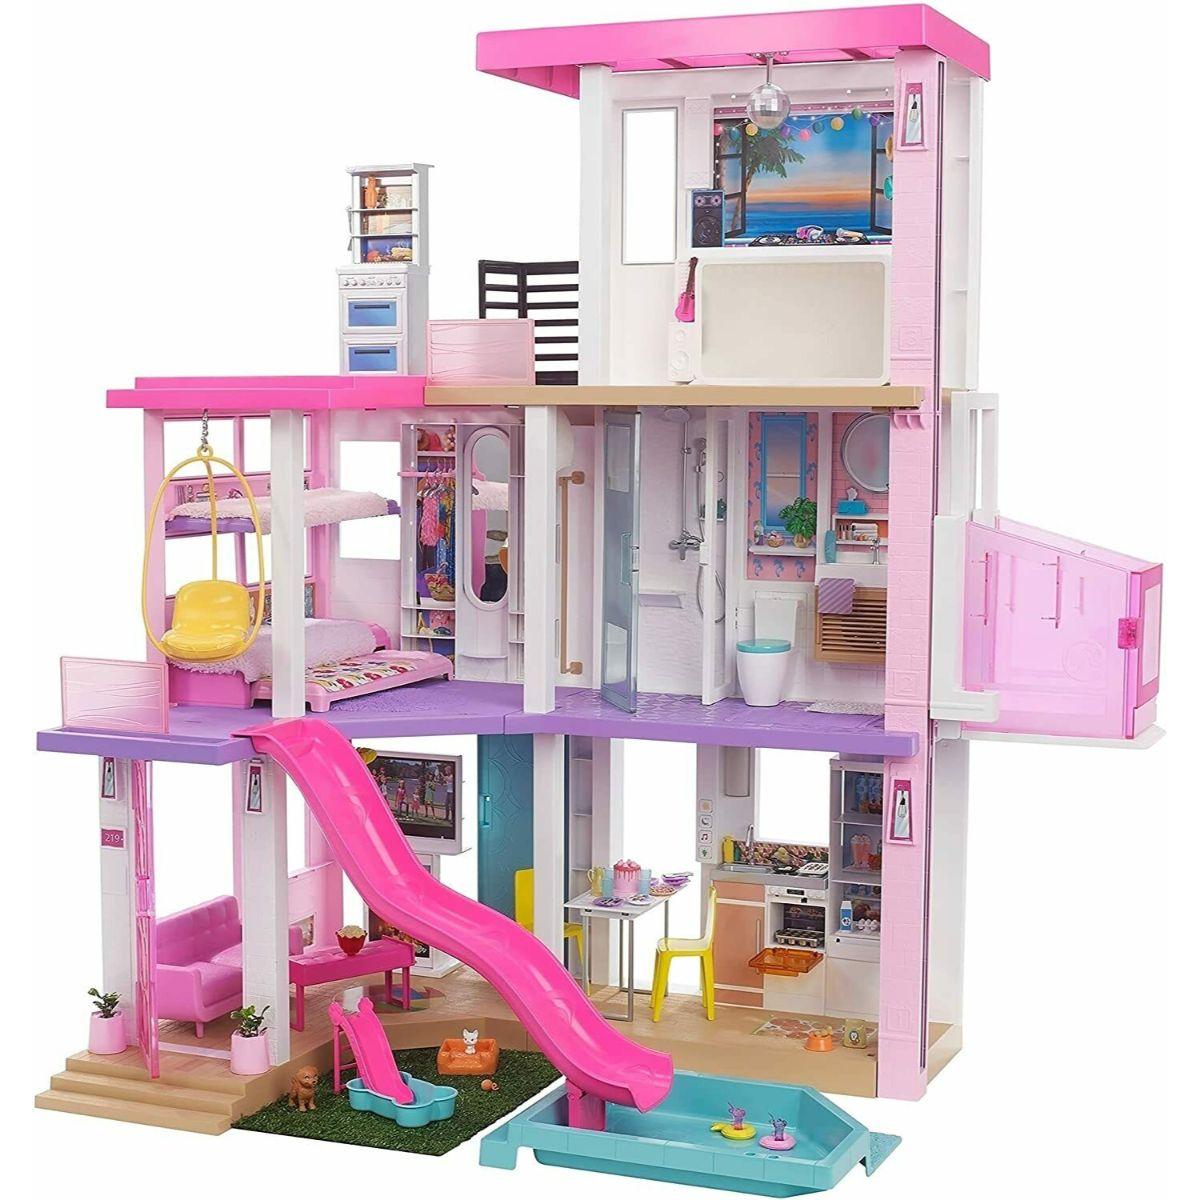 Set Casa de papusi Barbie Dreamhouse (114 cm) cu piscina, tobogan, lift, lumini si sunete